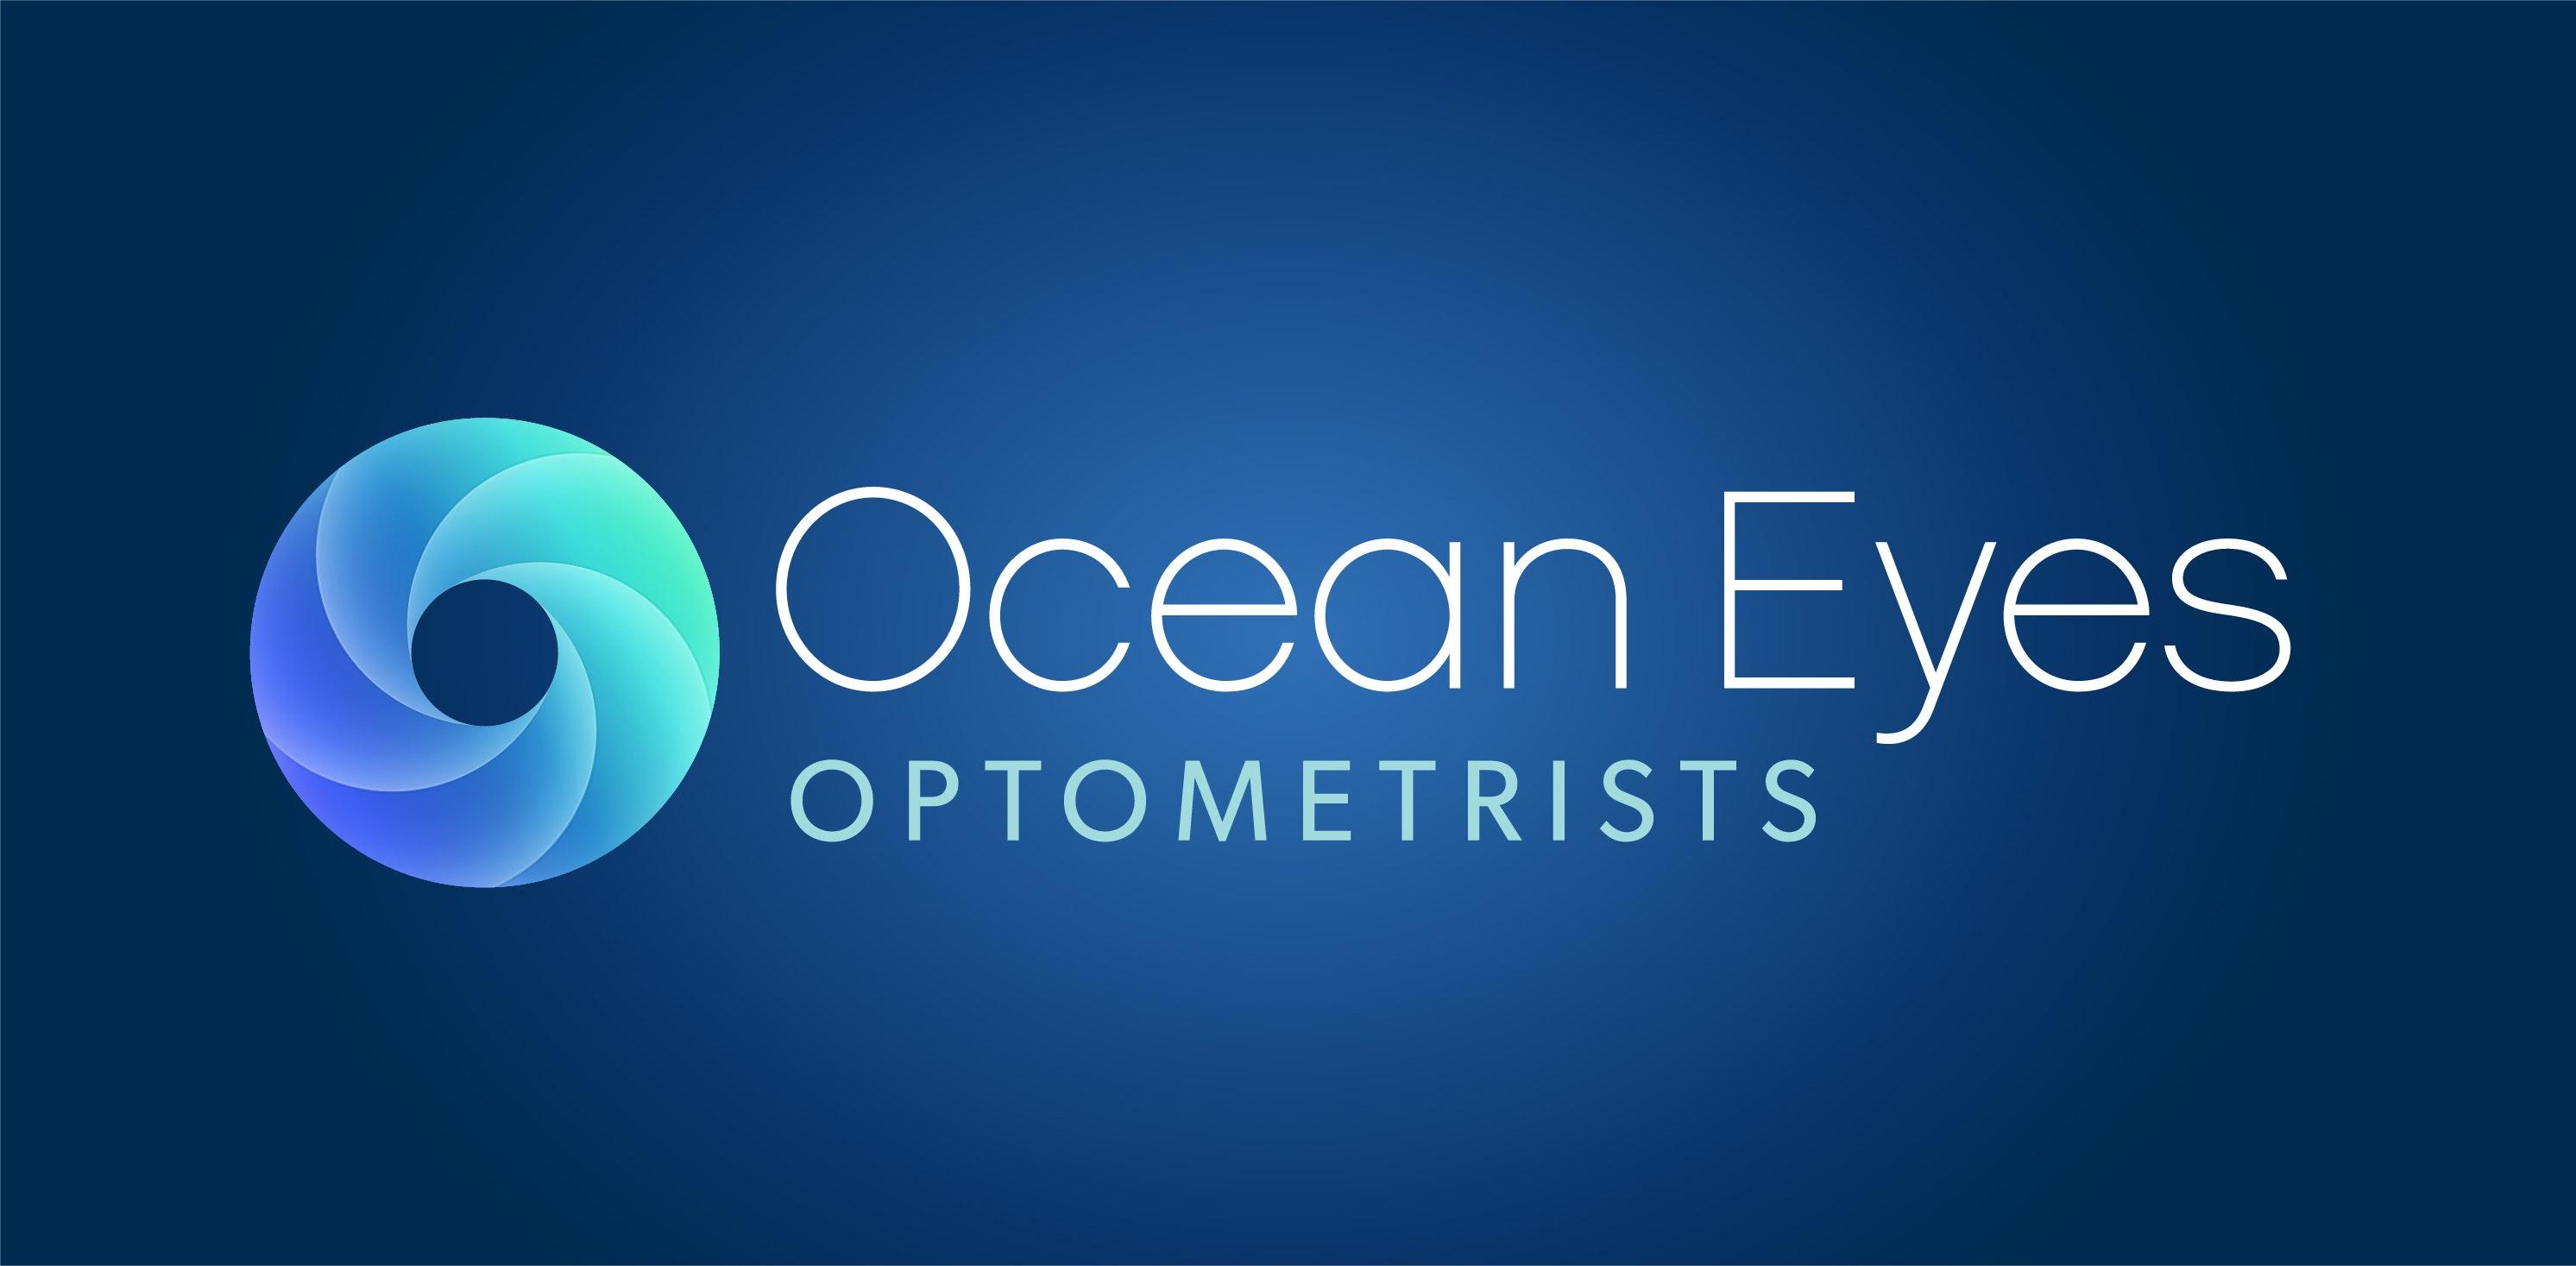 logo for Ocean Eyes Optometrists Optometrists